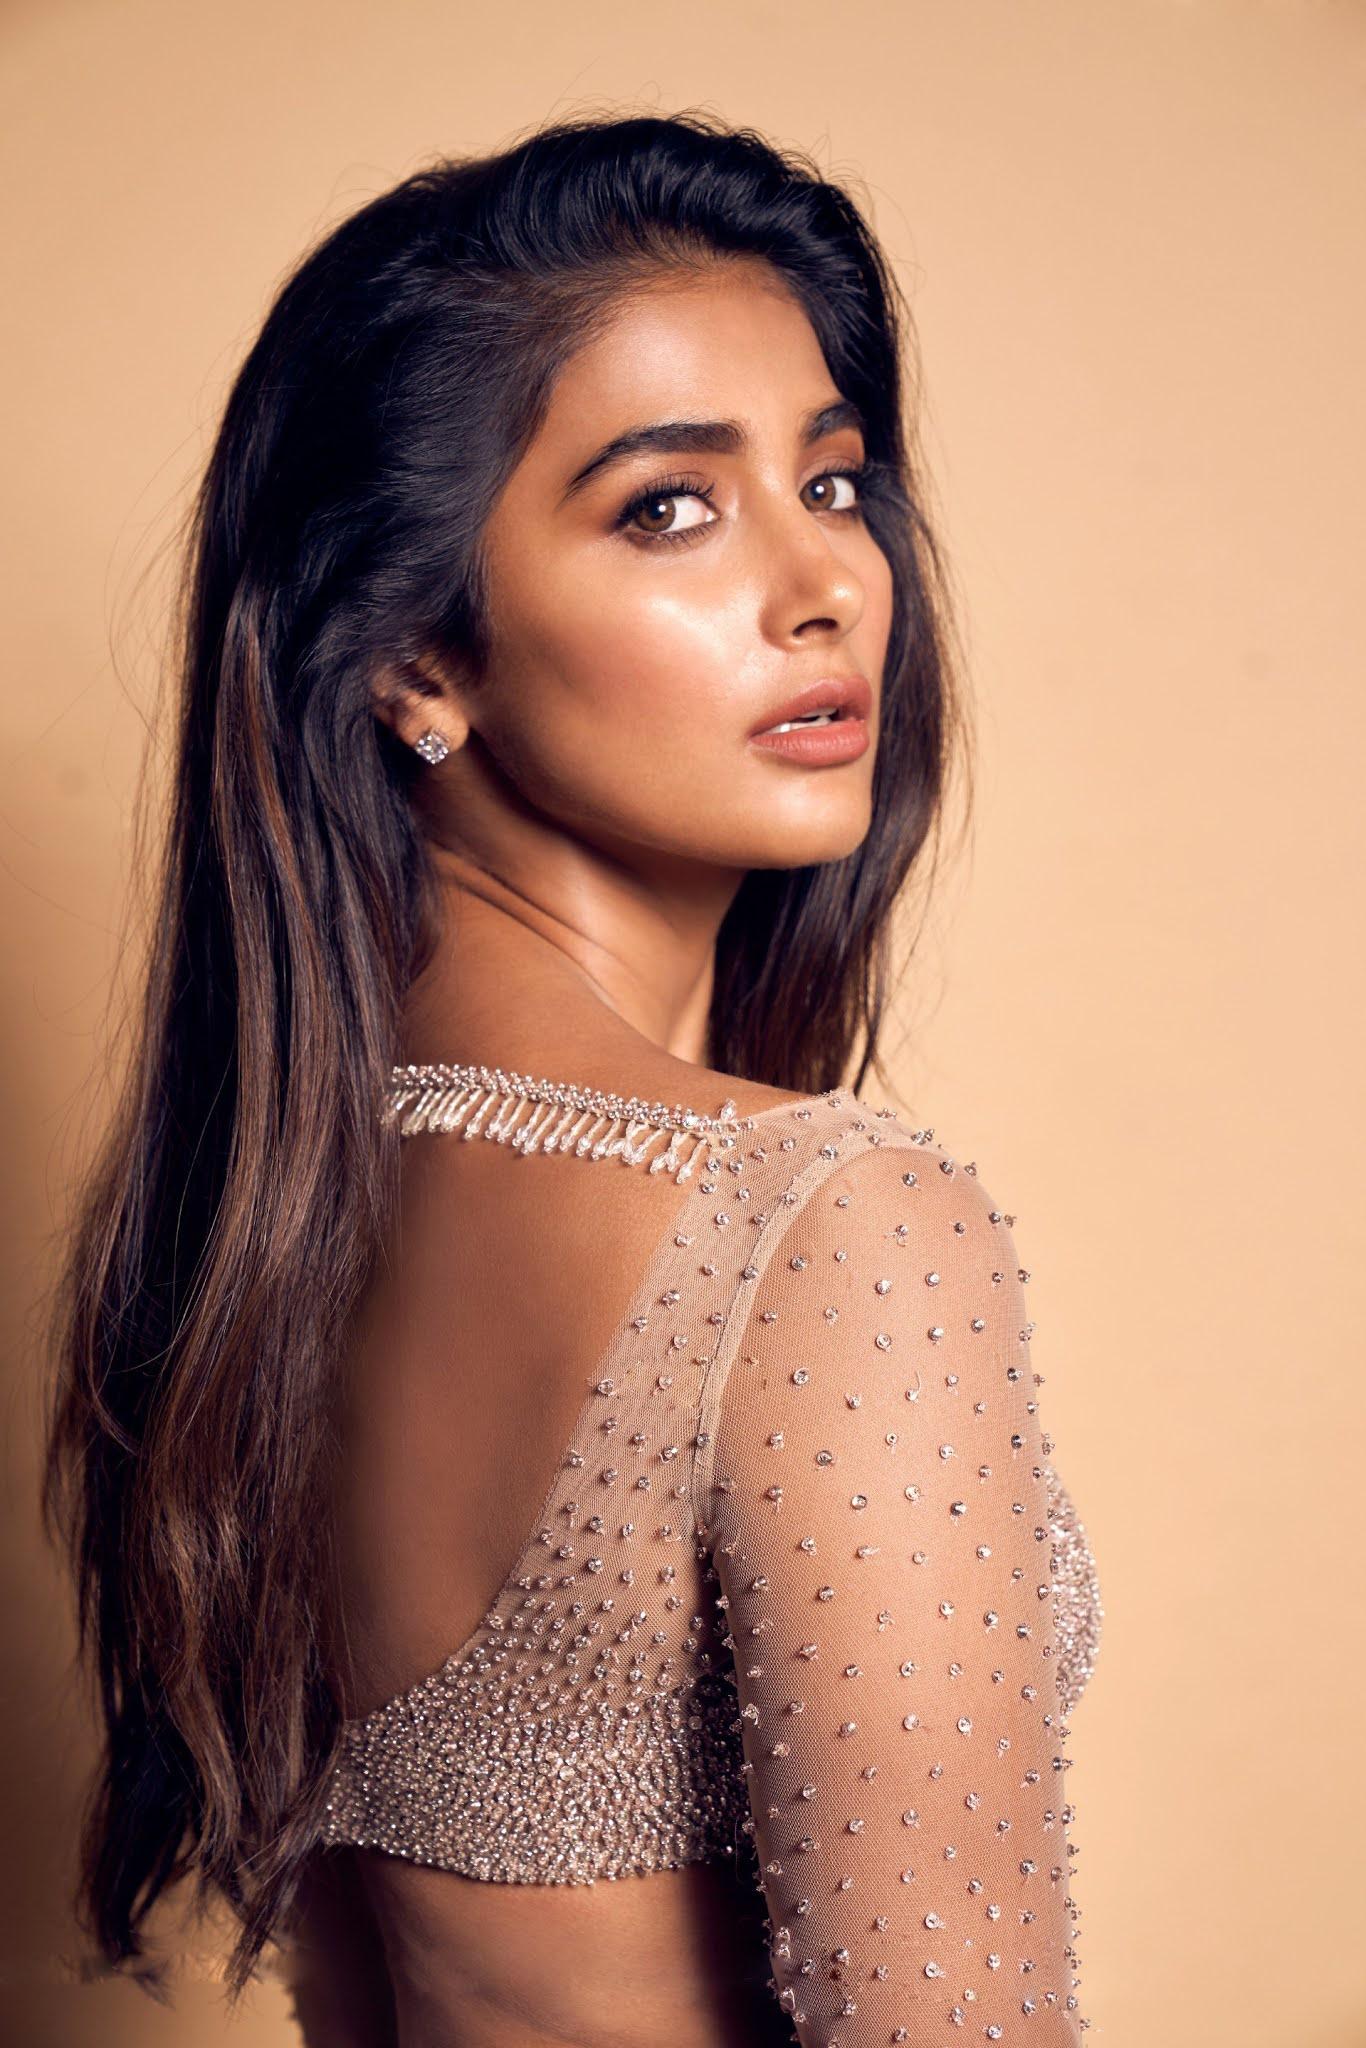 Actress Pooja Hegde    Glam Photoshoot